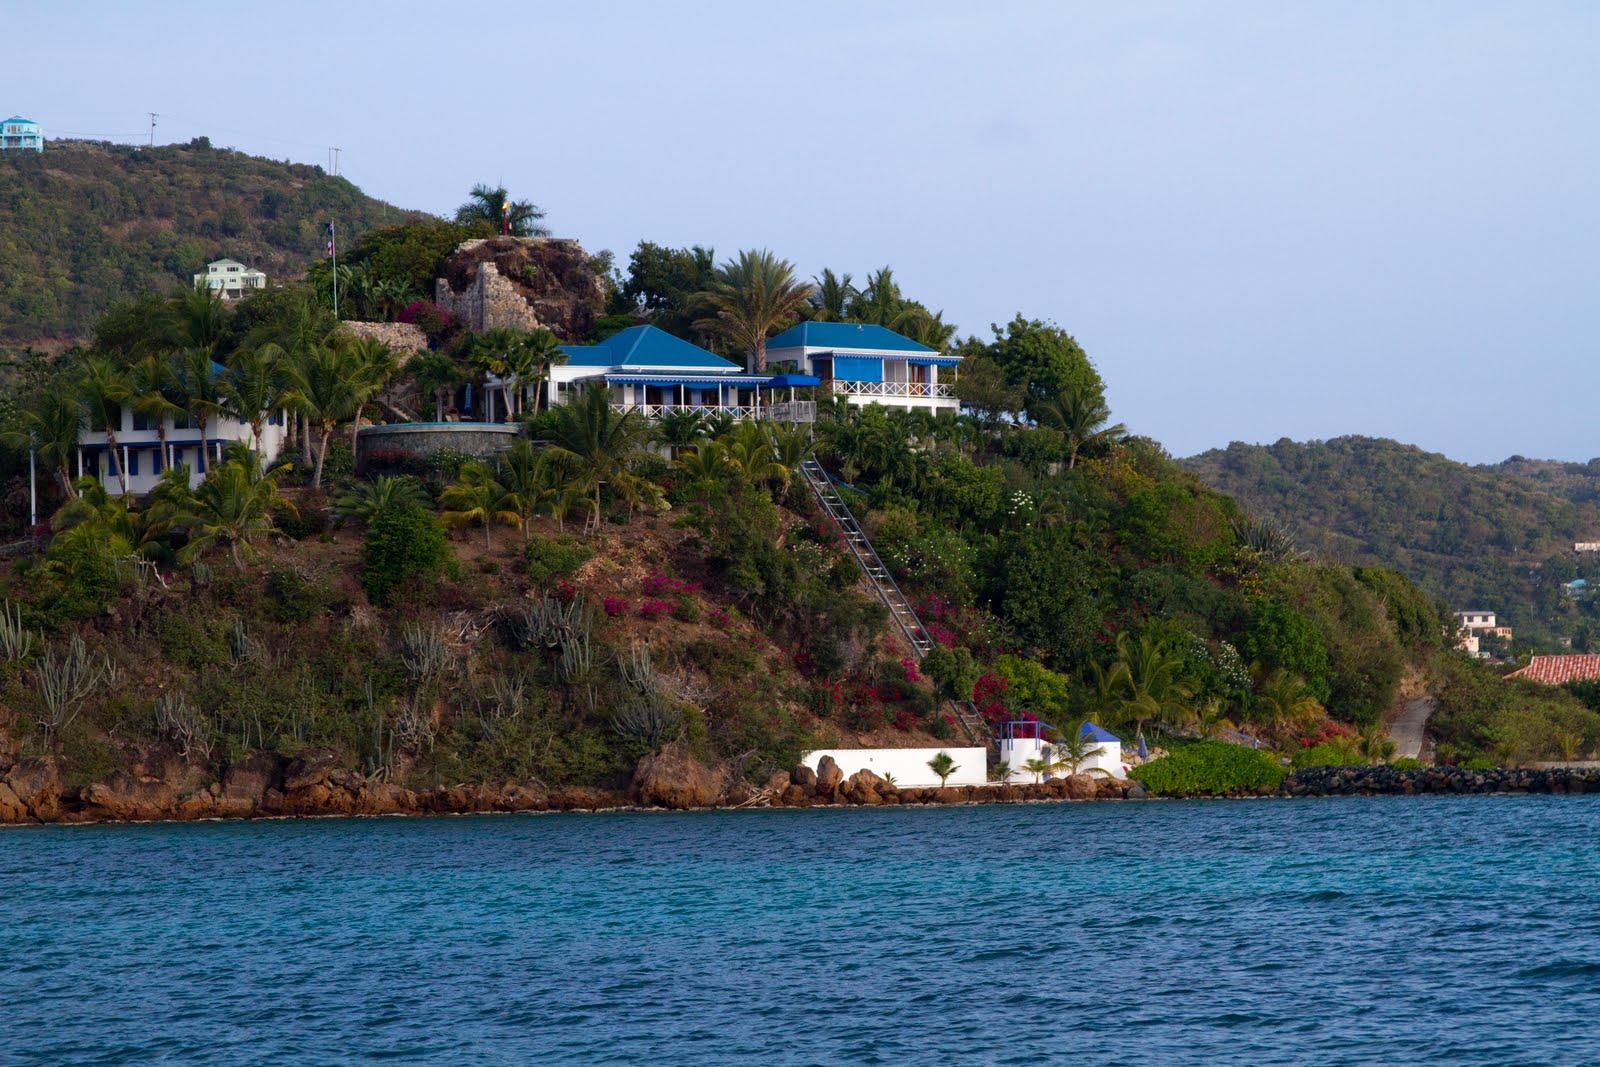 Noleggio Barche Maya Cove - Navalia | Noleggia un Sogno